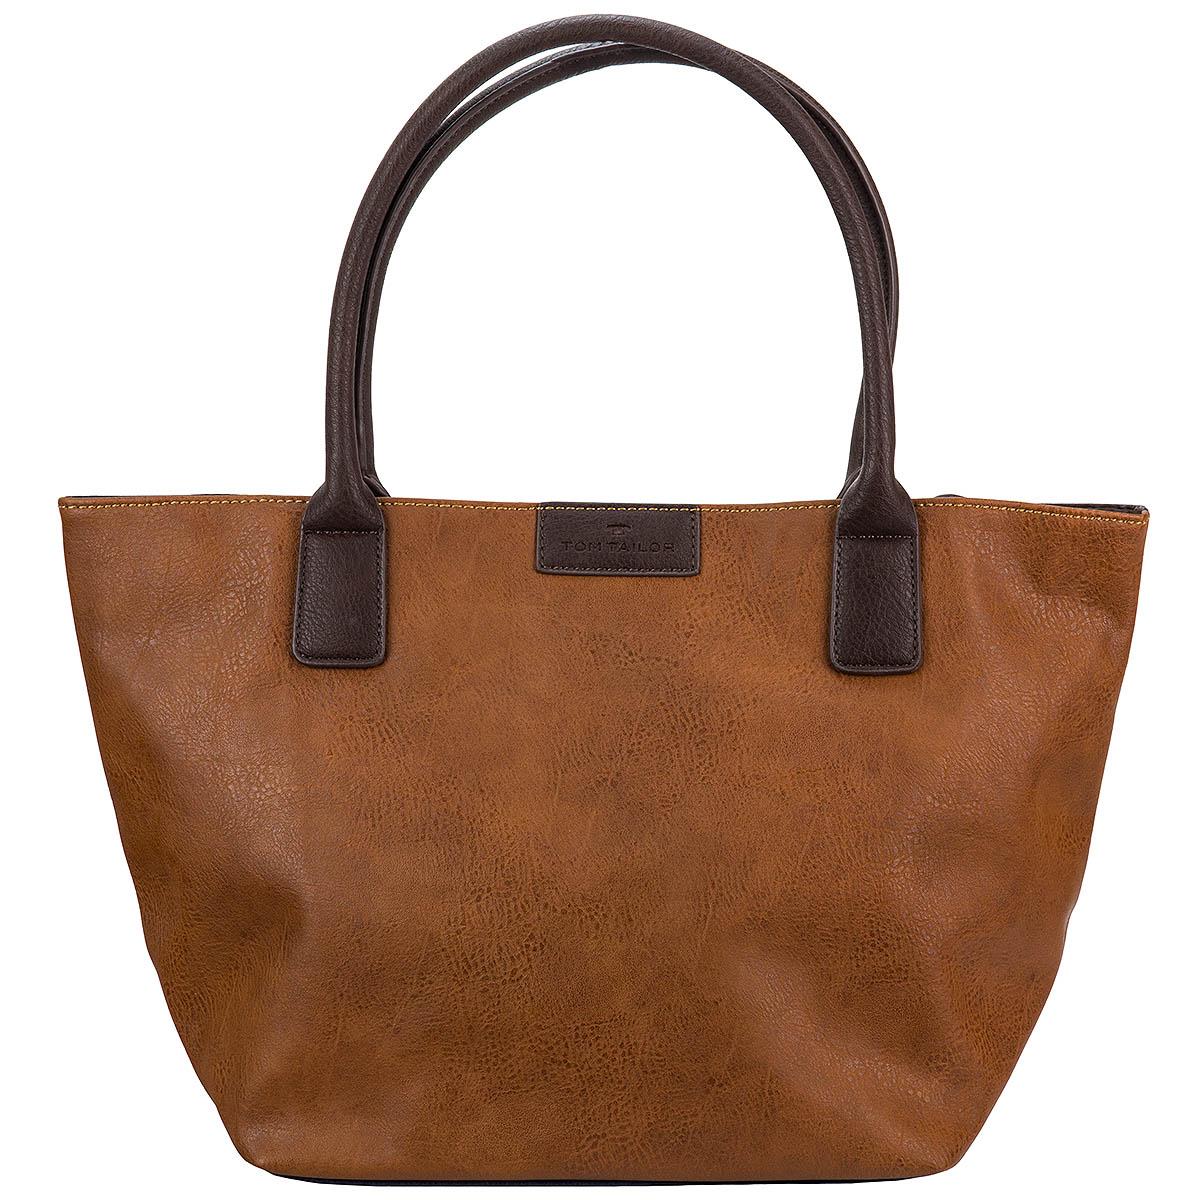 tom tailor shopper handtasche beuteltasche tasche miri. Black Bedroom Furniture Sets. Home Design Ideas